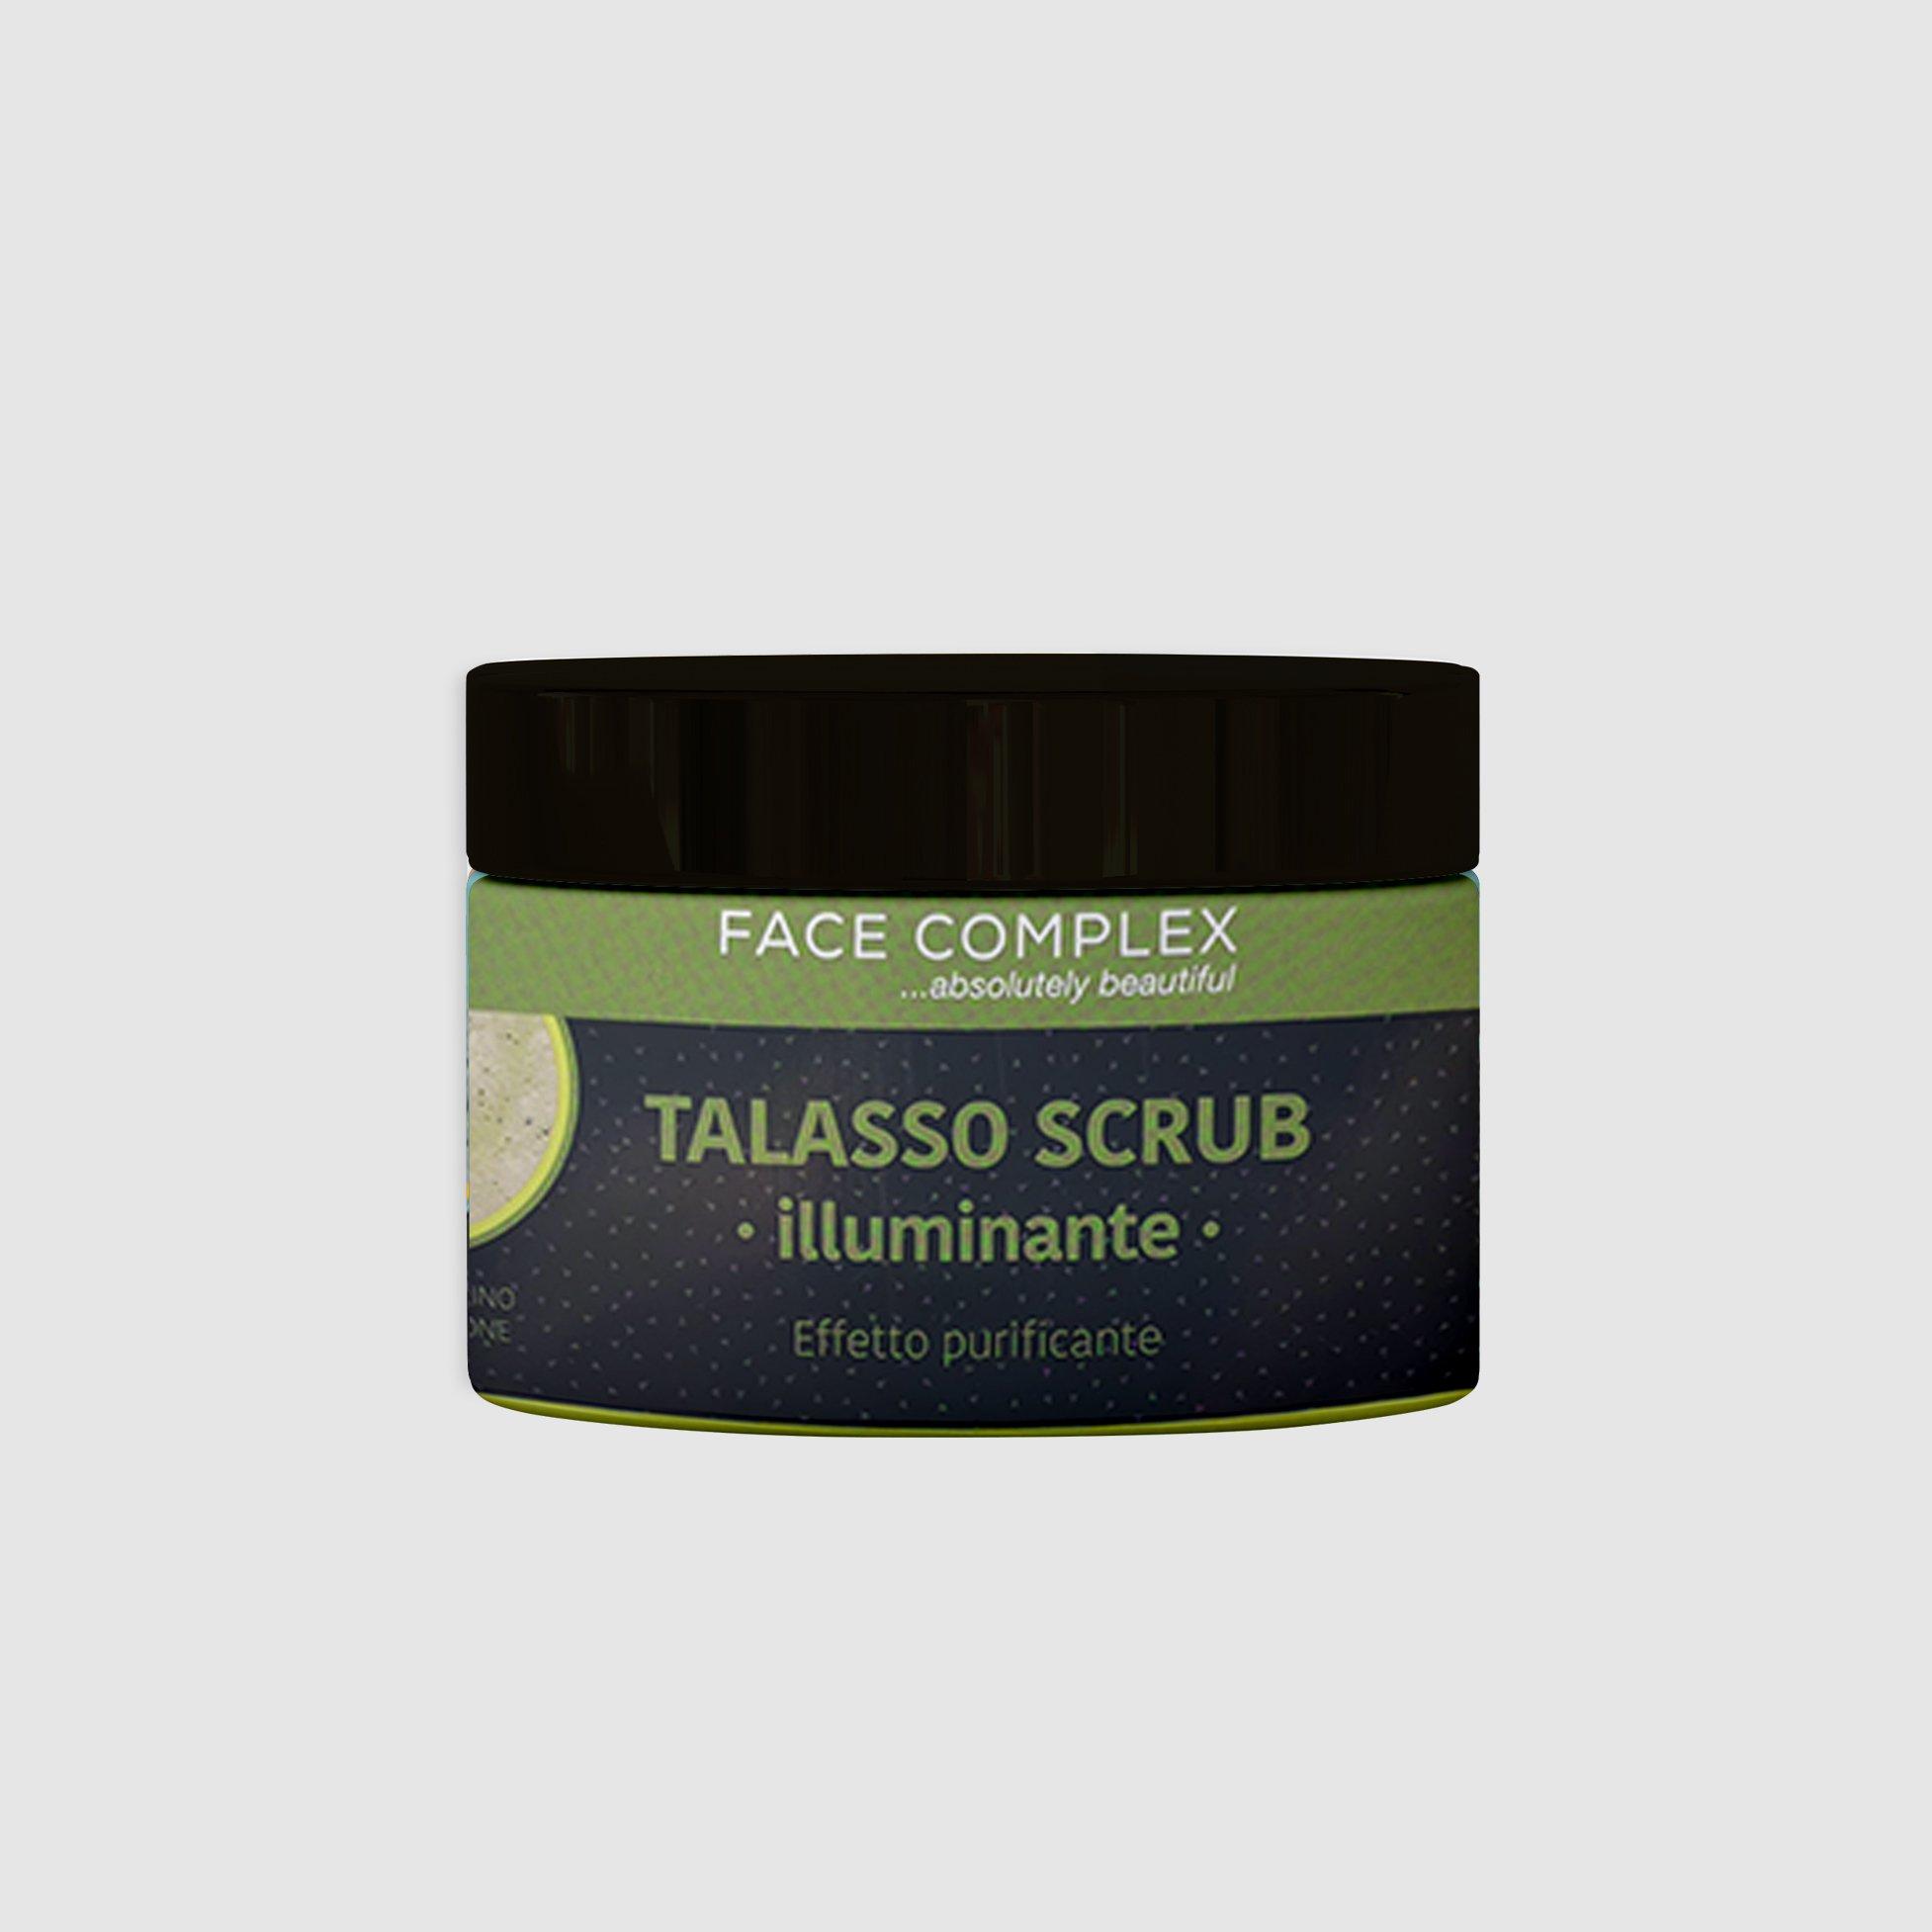 Talasso scrub Illuminante